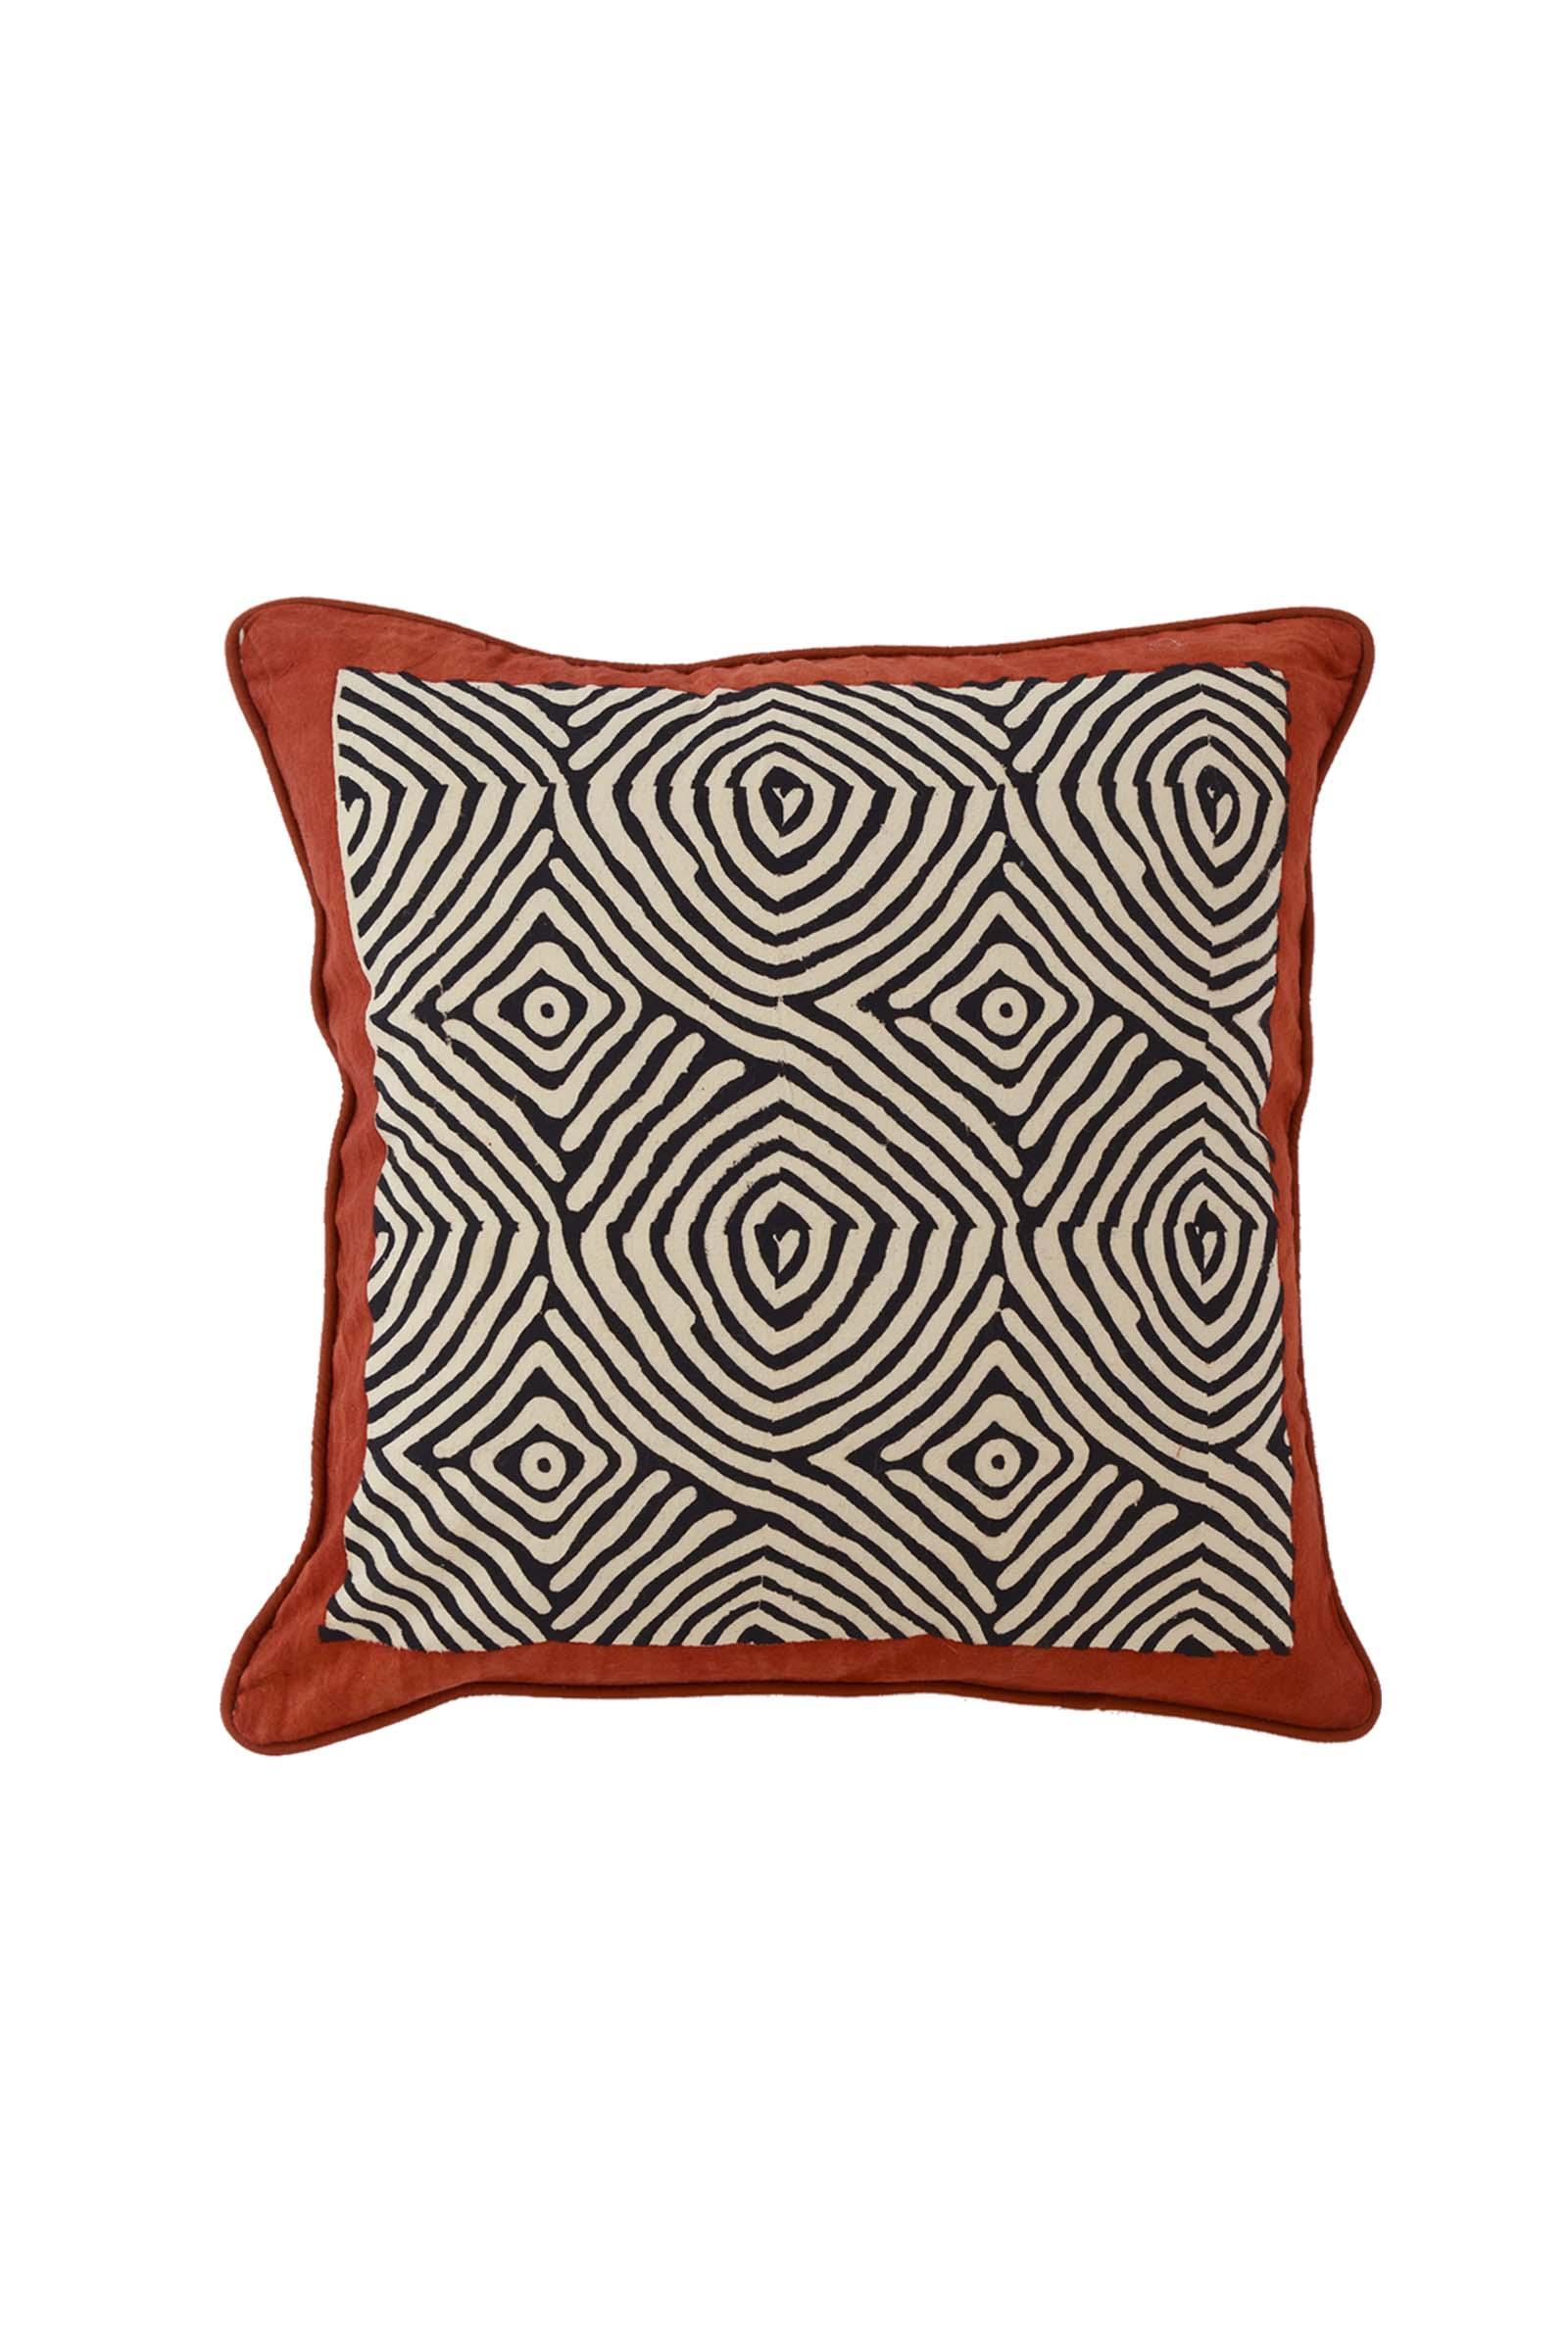 Vrindavan Spiral  Cushion Cover